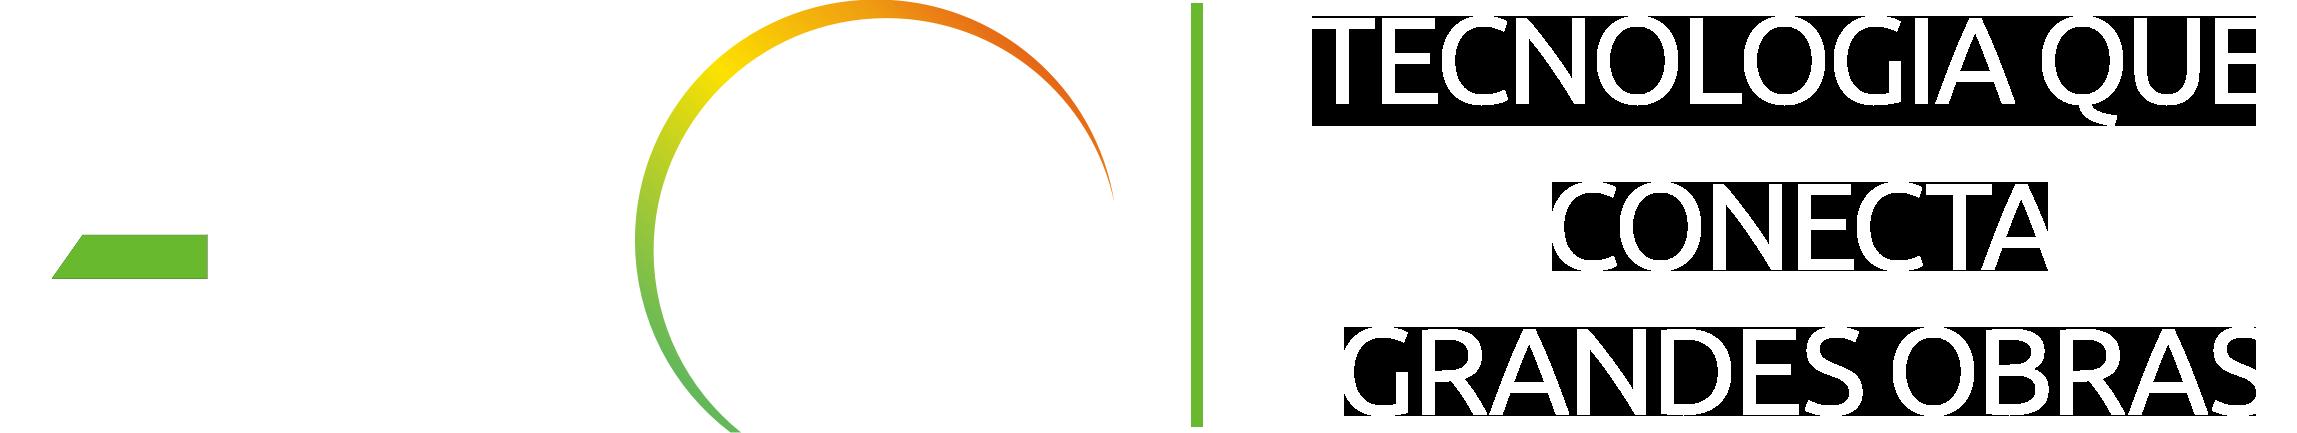 tigreads-logo3